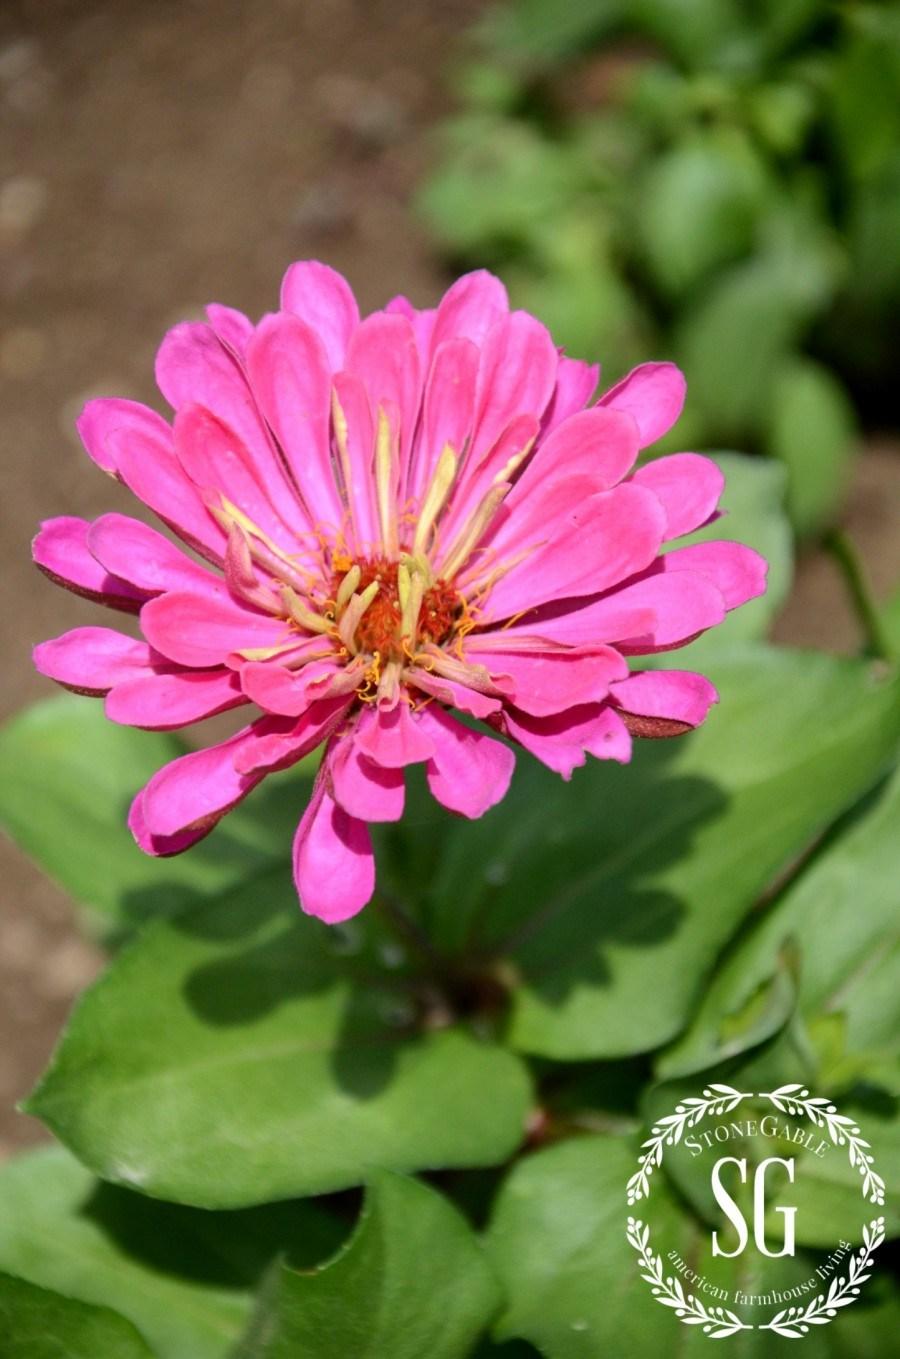 VEGETABLE GARDEN-zinnias-stonegableblog.com